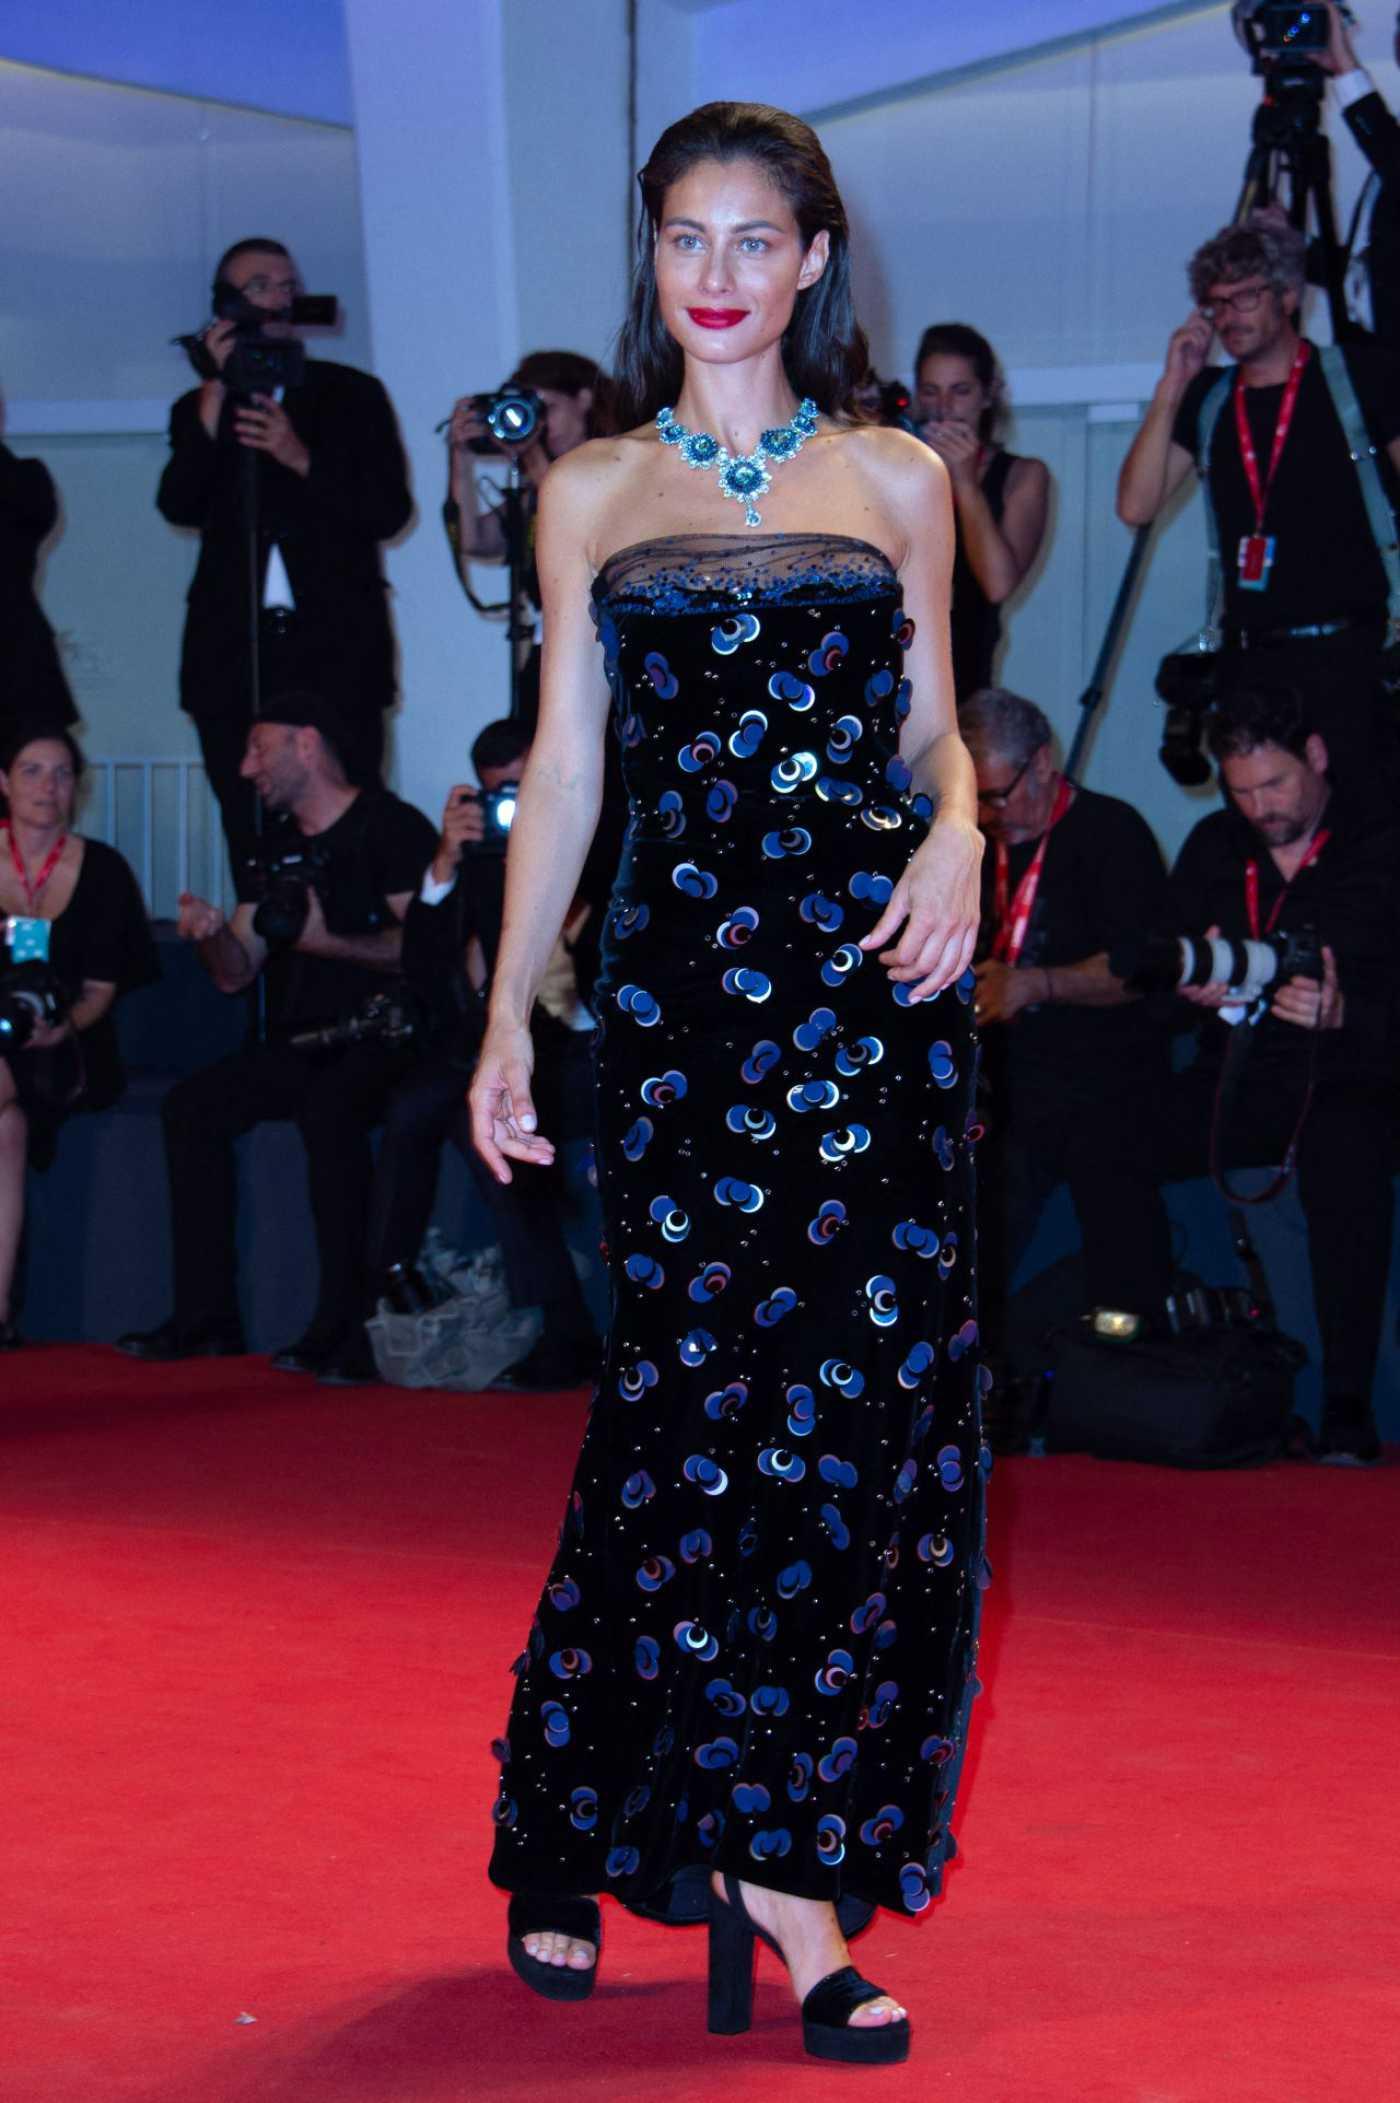 Marica Pellegrinelli Attends Seberg Screening During the 76th Venice Film Festival in Venice 08/30/2019